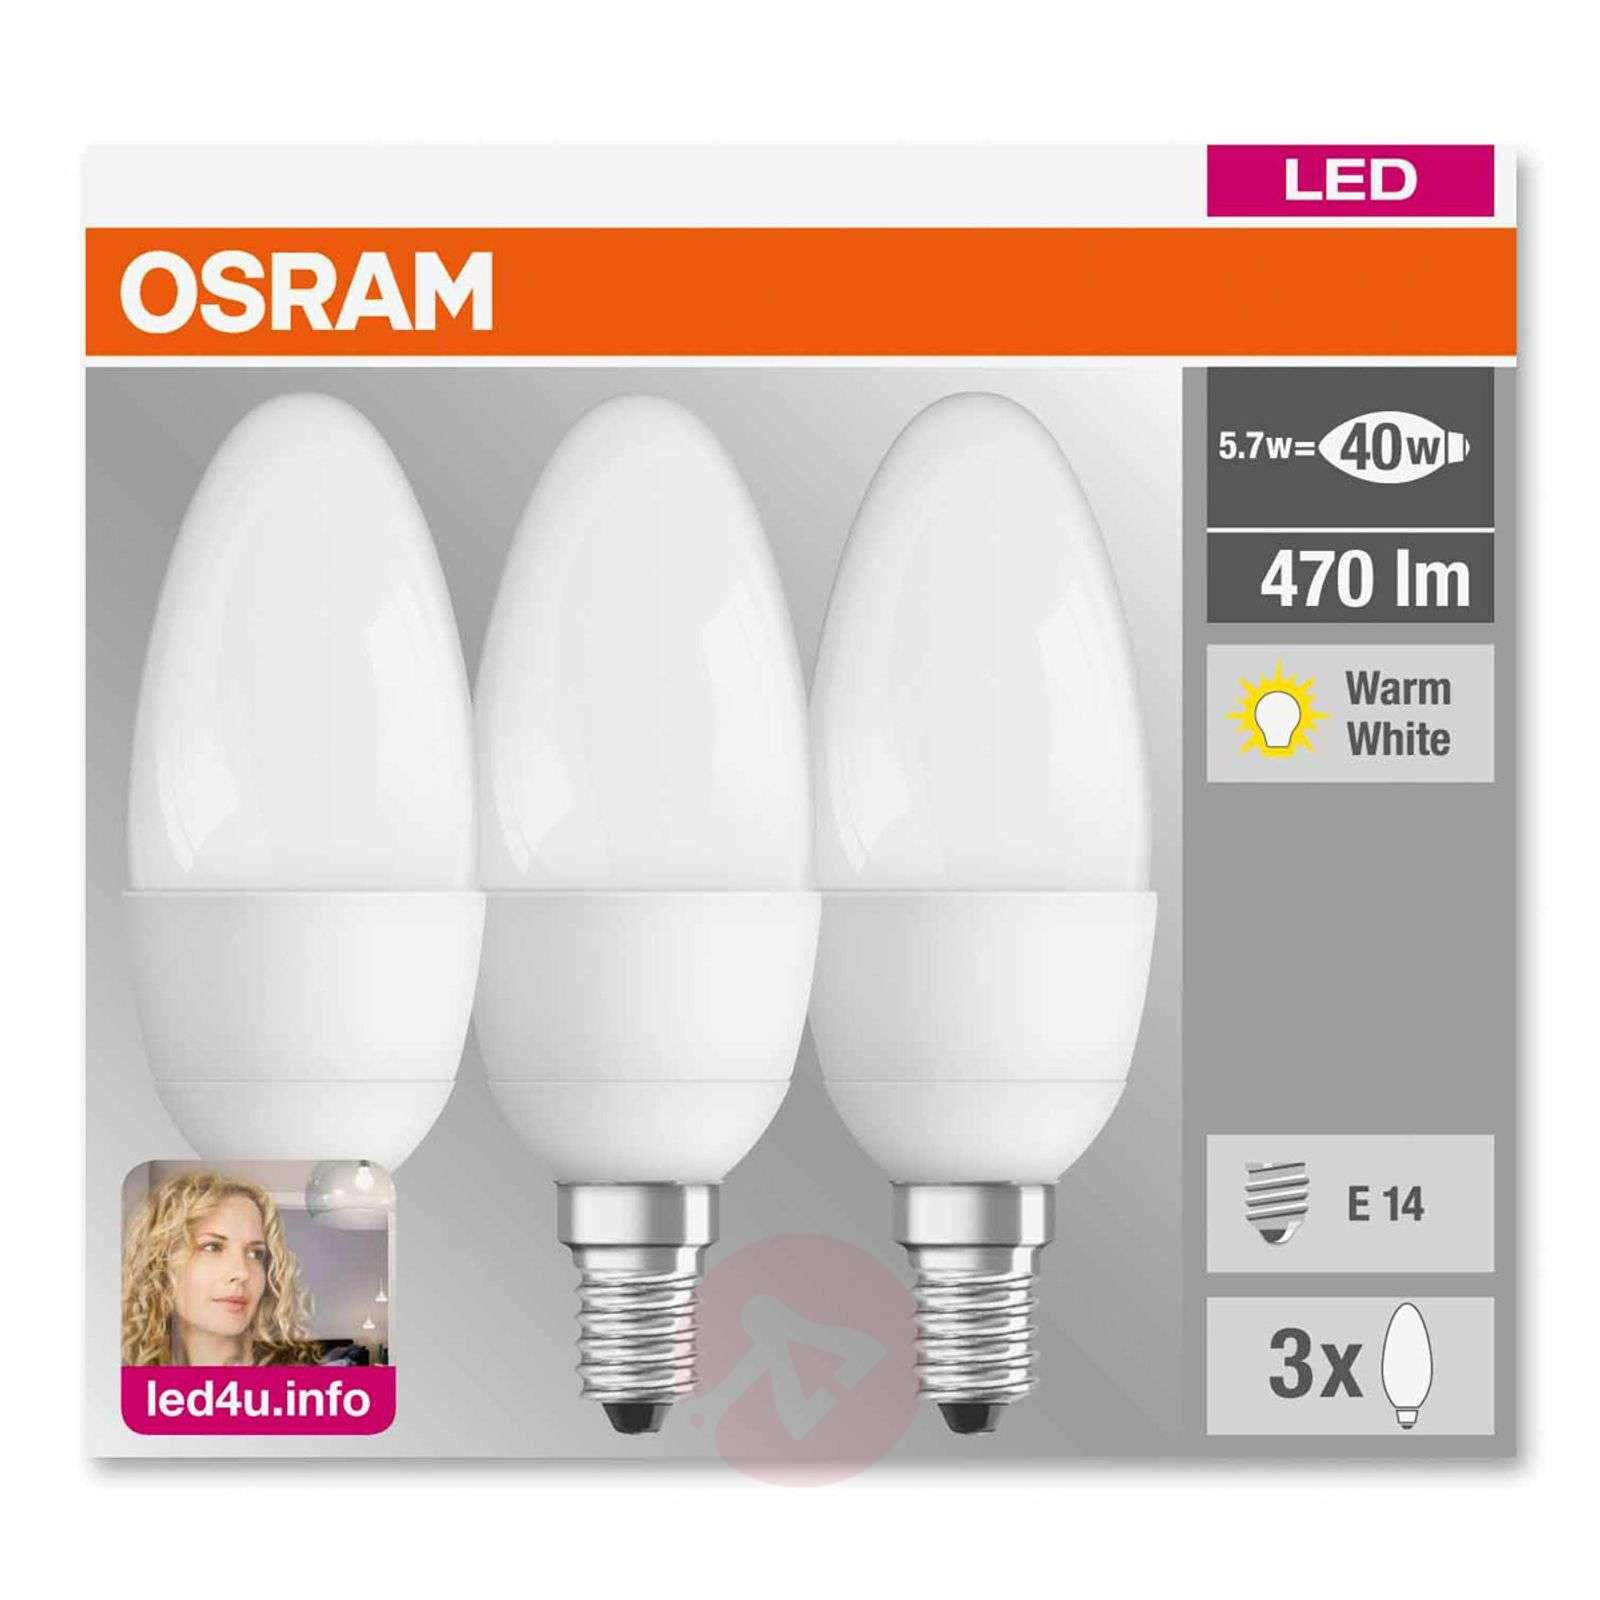 E27 5.3 W 827 LED candle bulb, set of three, matt-7260976-01